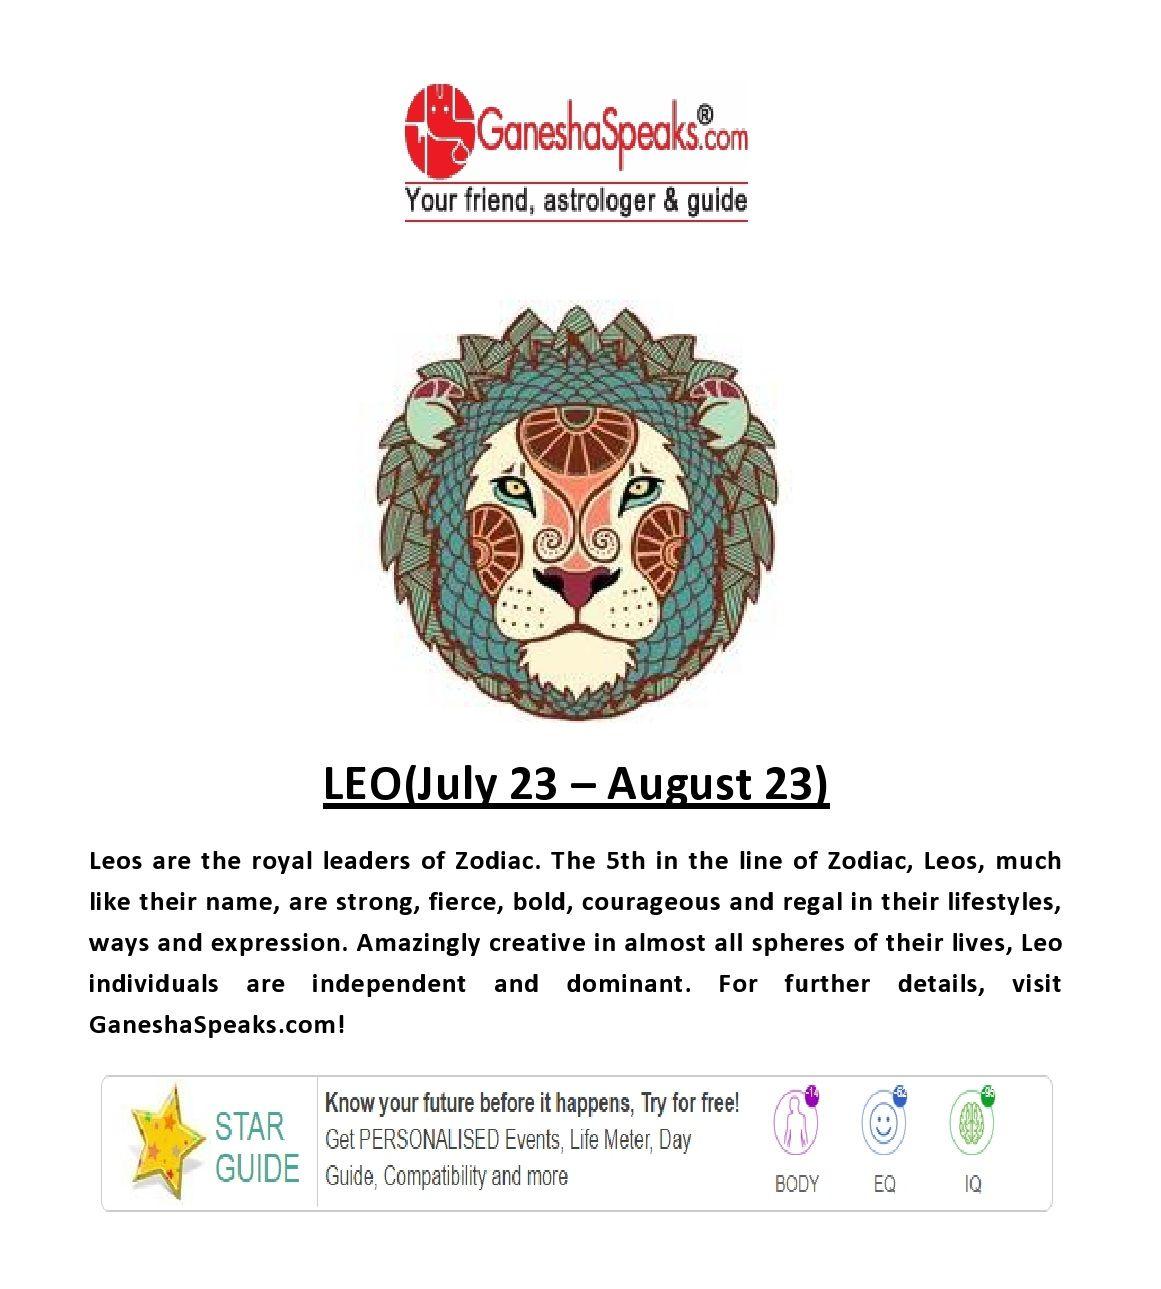 leo astrology ganesha speaks